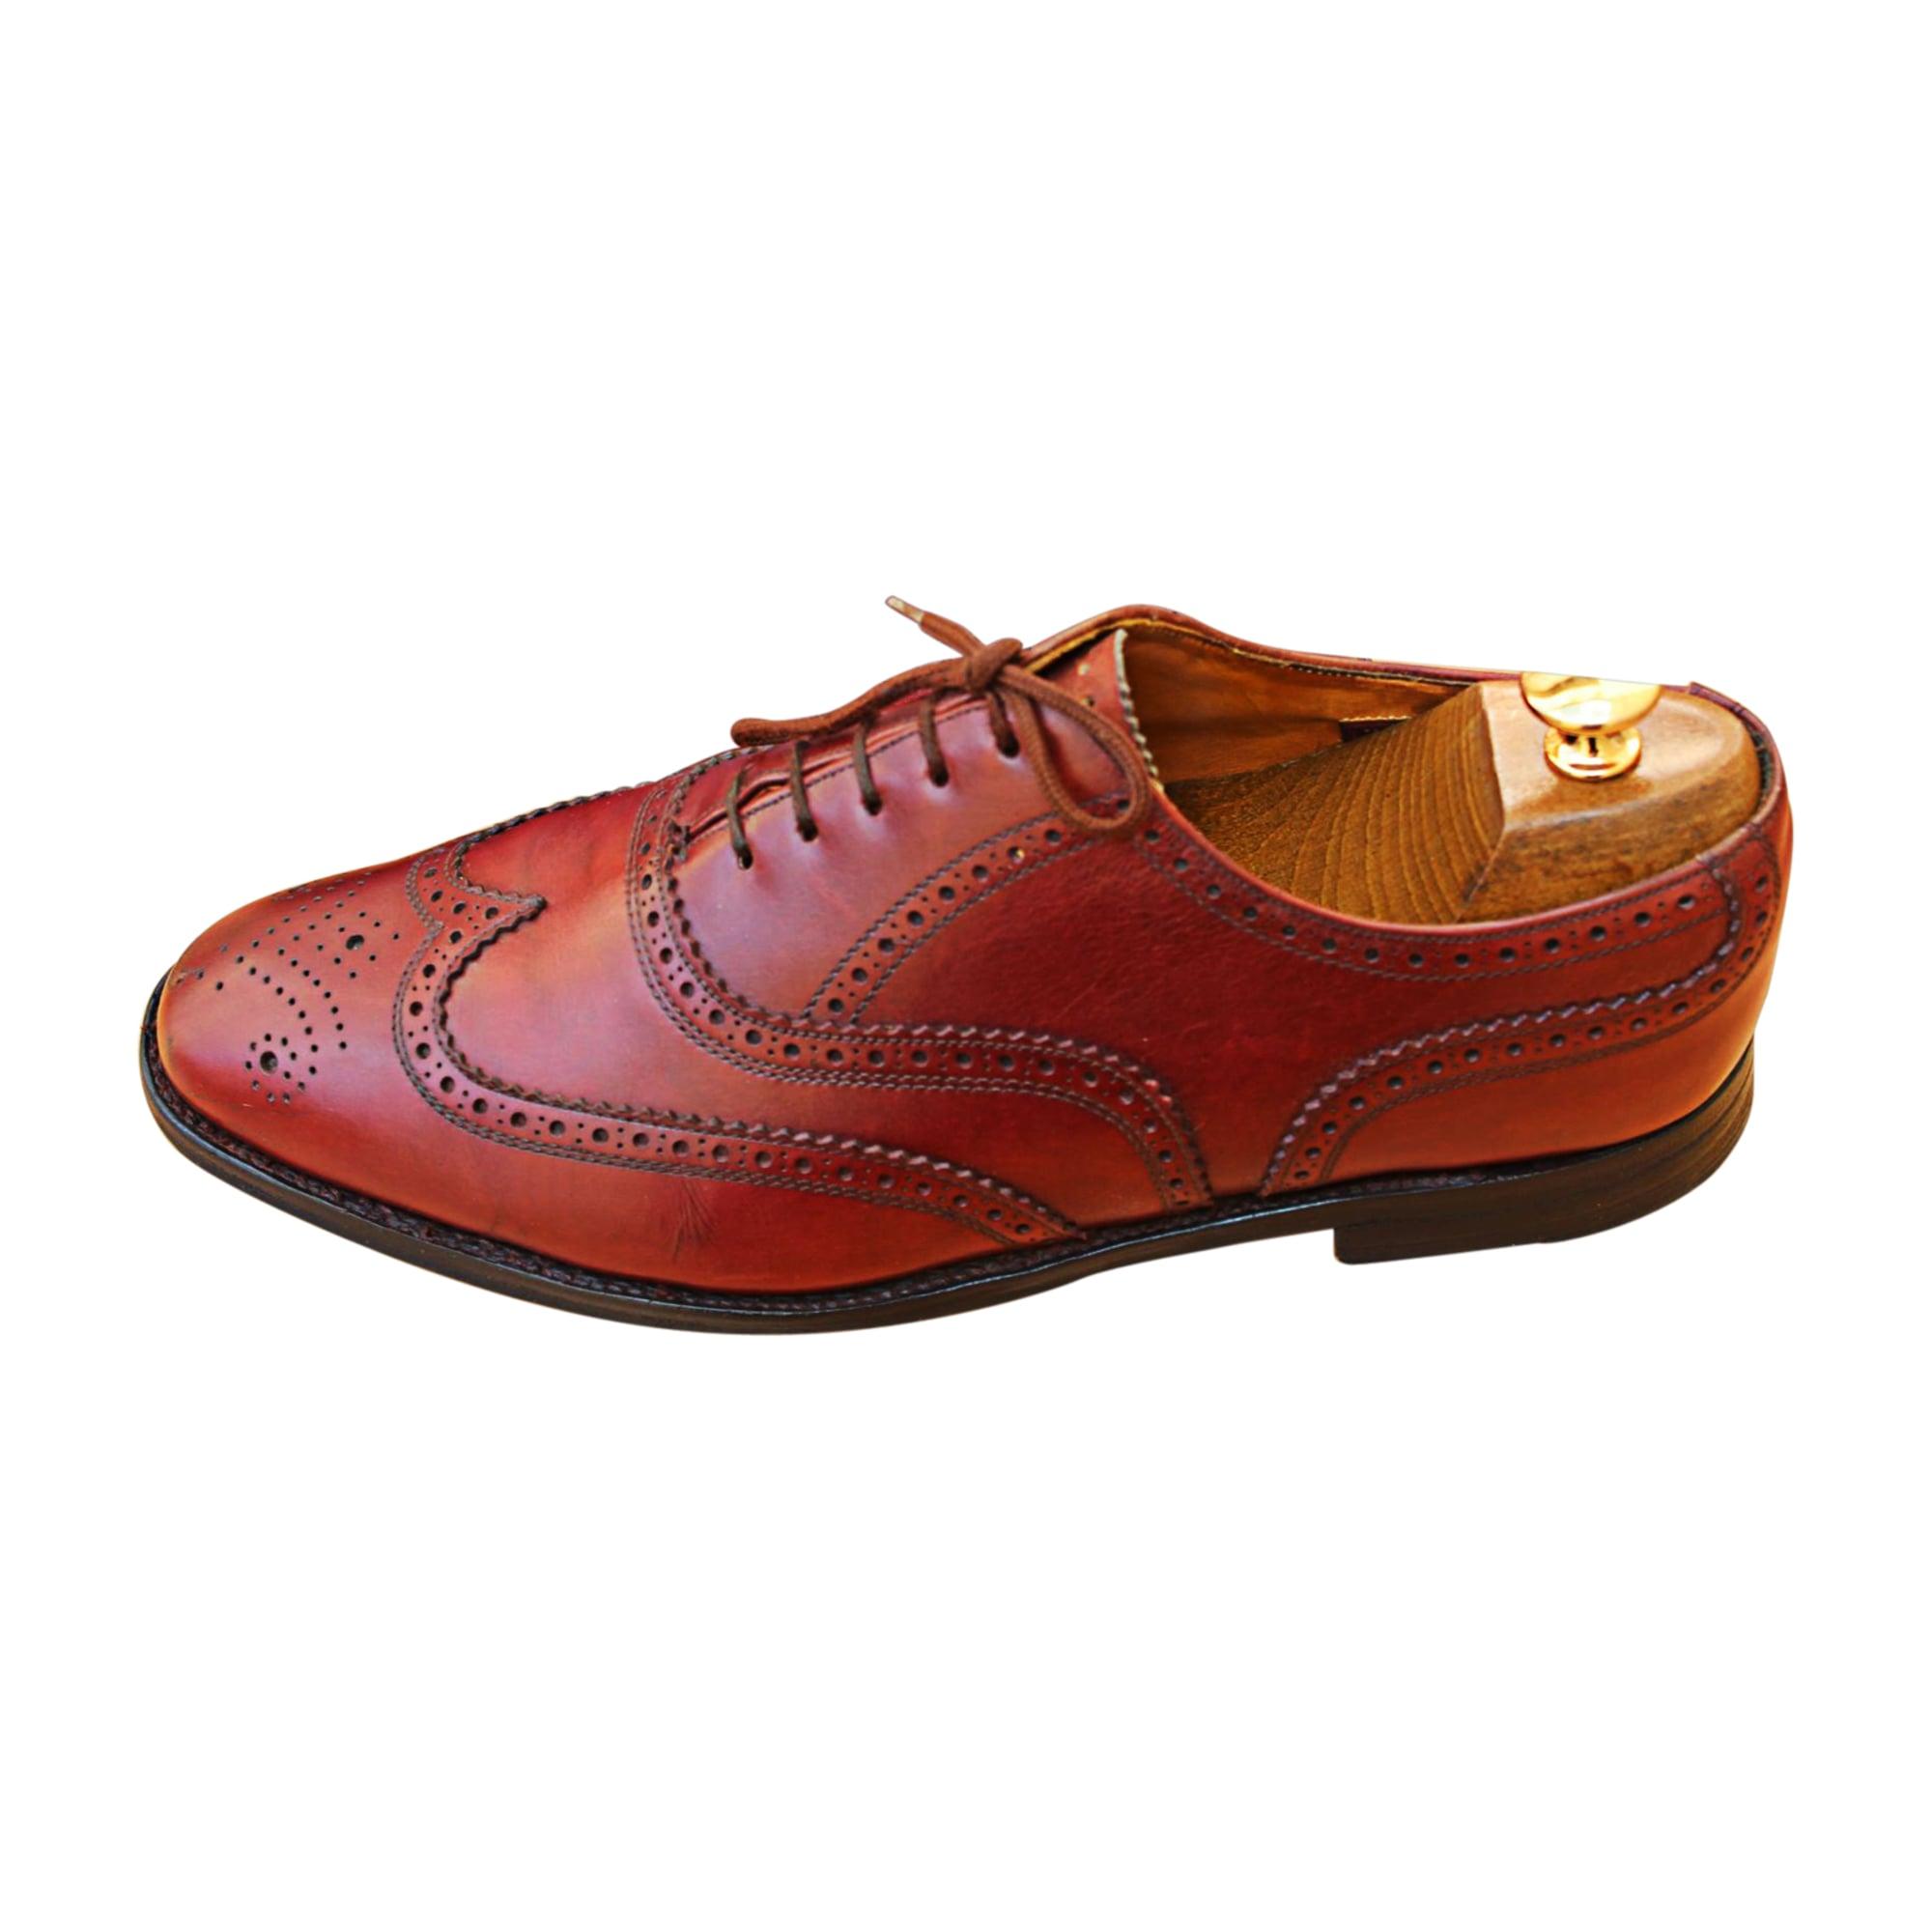 7832418 Chaussures Burberry Rouge À Lacets 43 OiPwkuTXZl